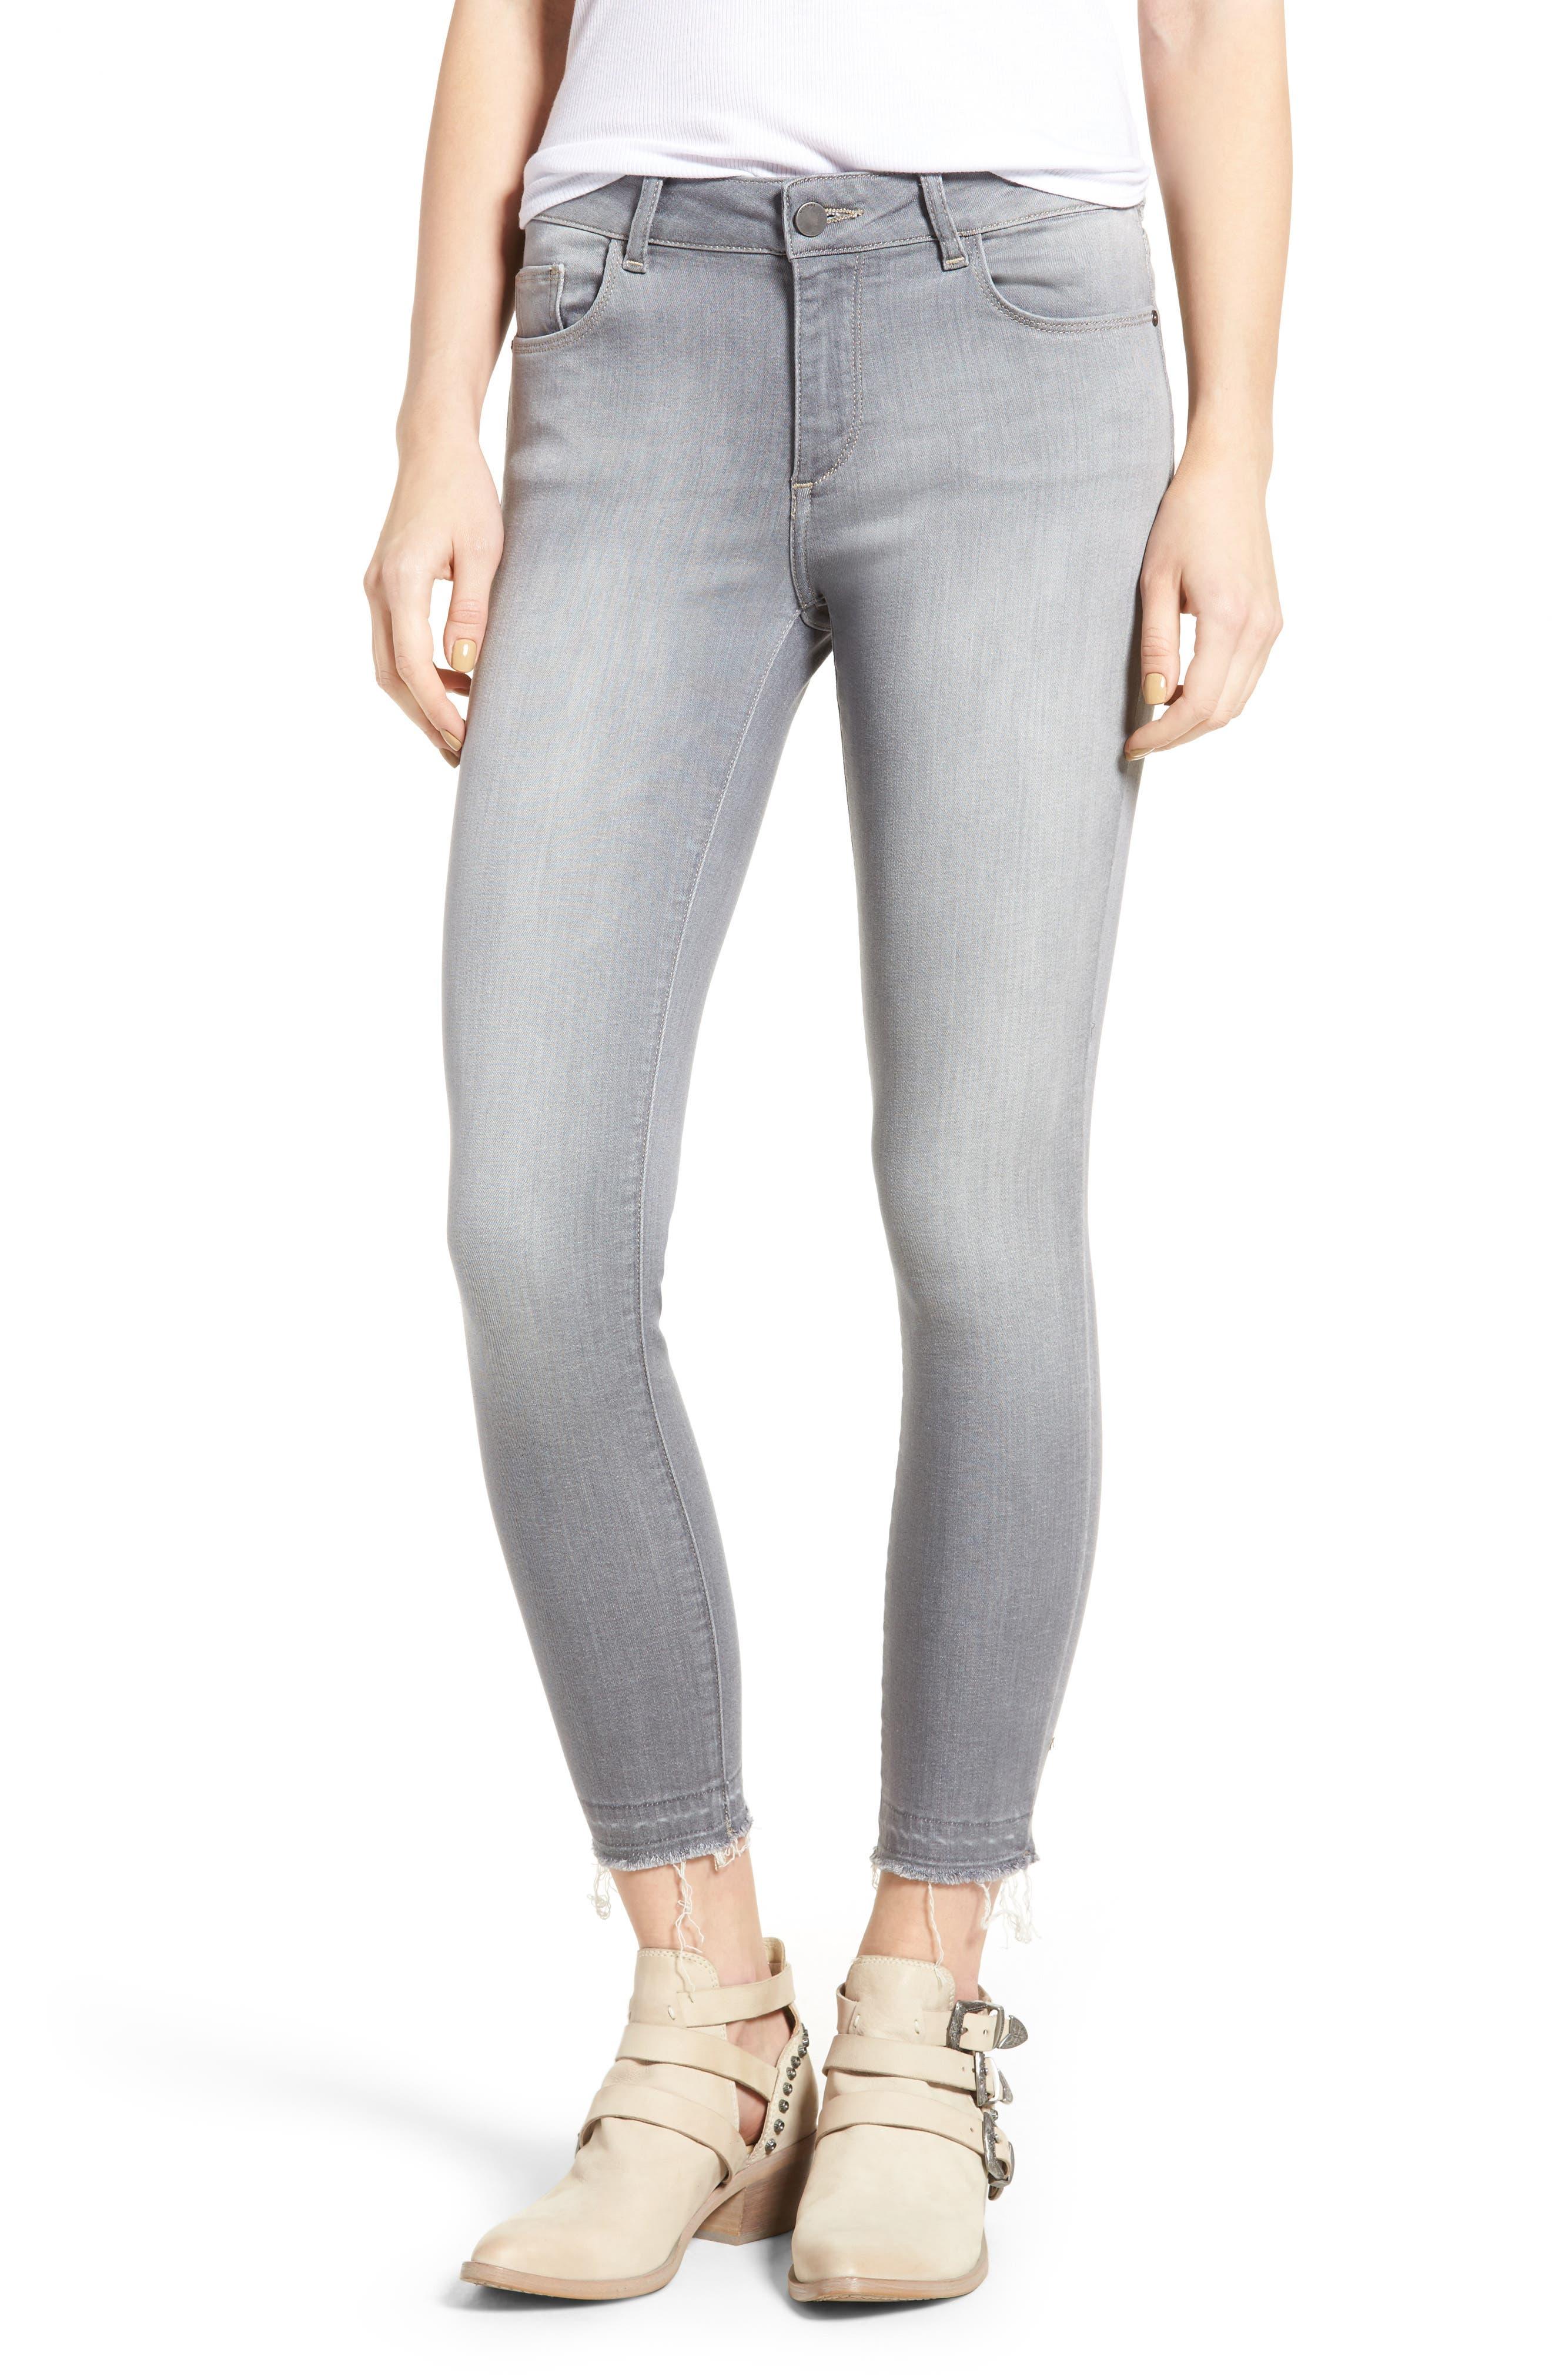 DL1961 Florence Instasculpt Crop Jeans (Cateye)